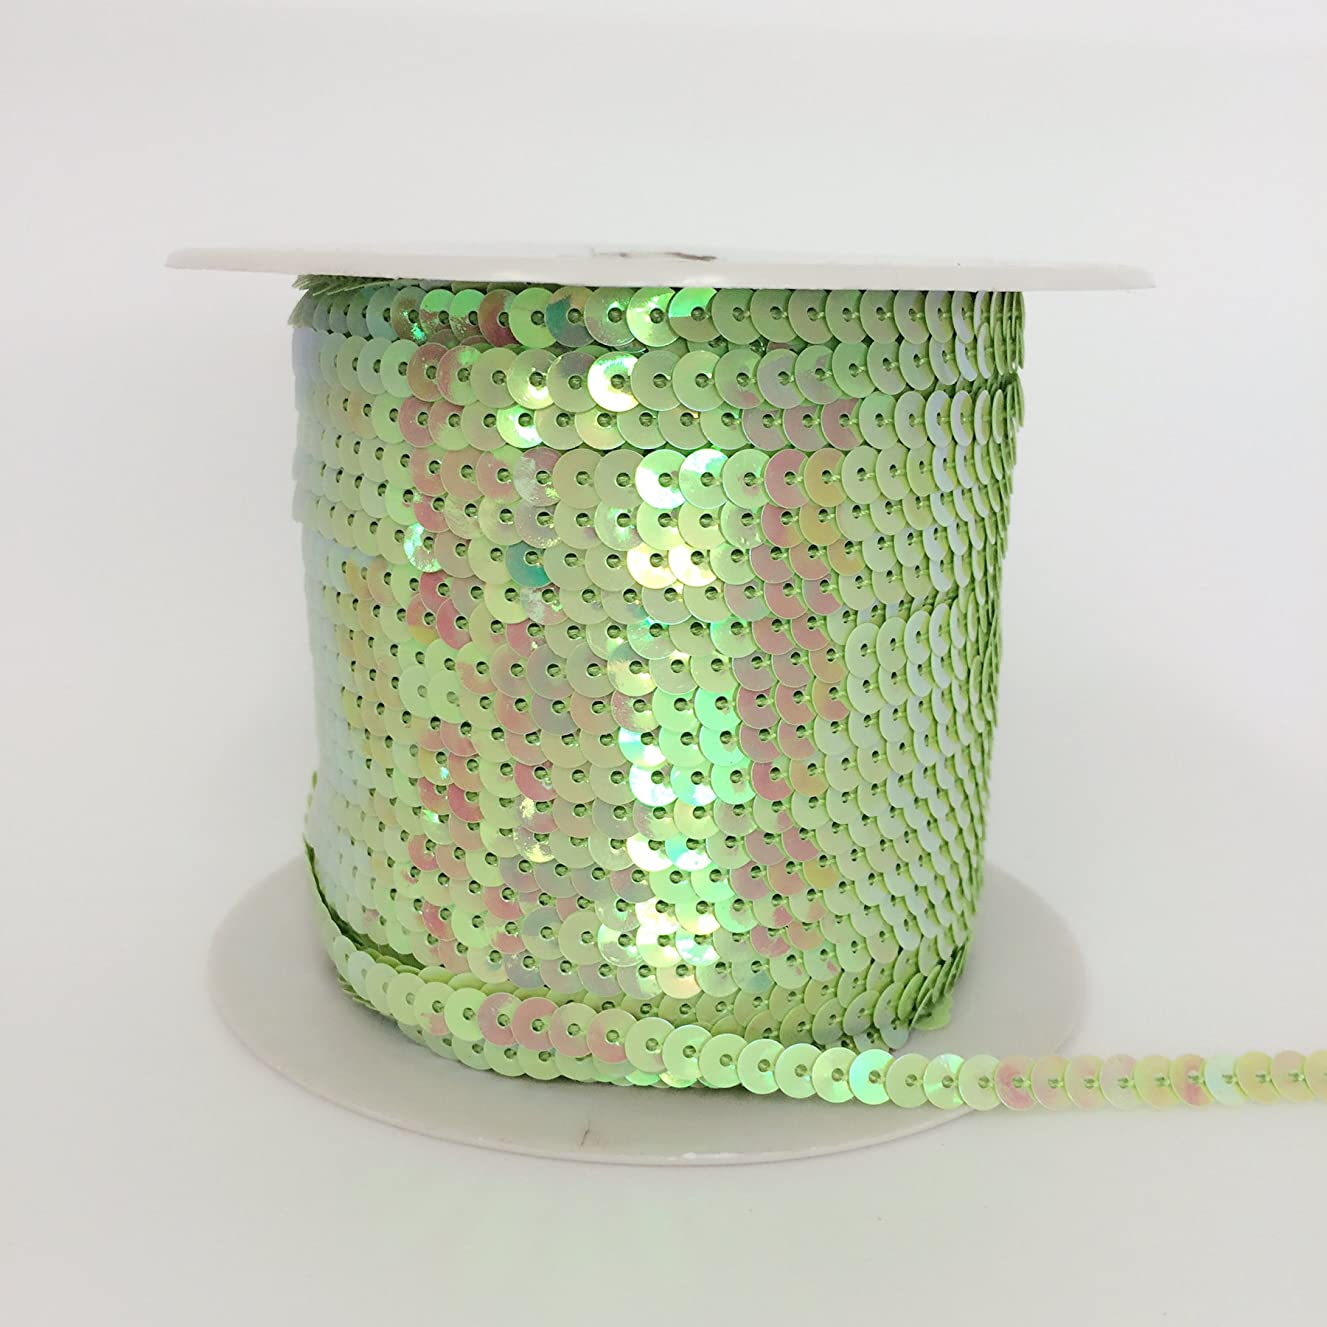 PEPPERLONELY Brand 100 Yard/Roll Metallic Flat Sequin Trim 5mm(3/16 Inch), Apple Green AB